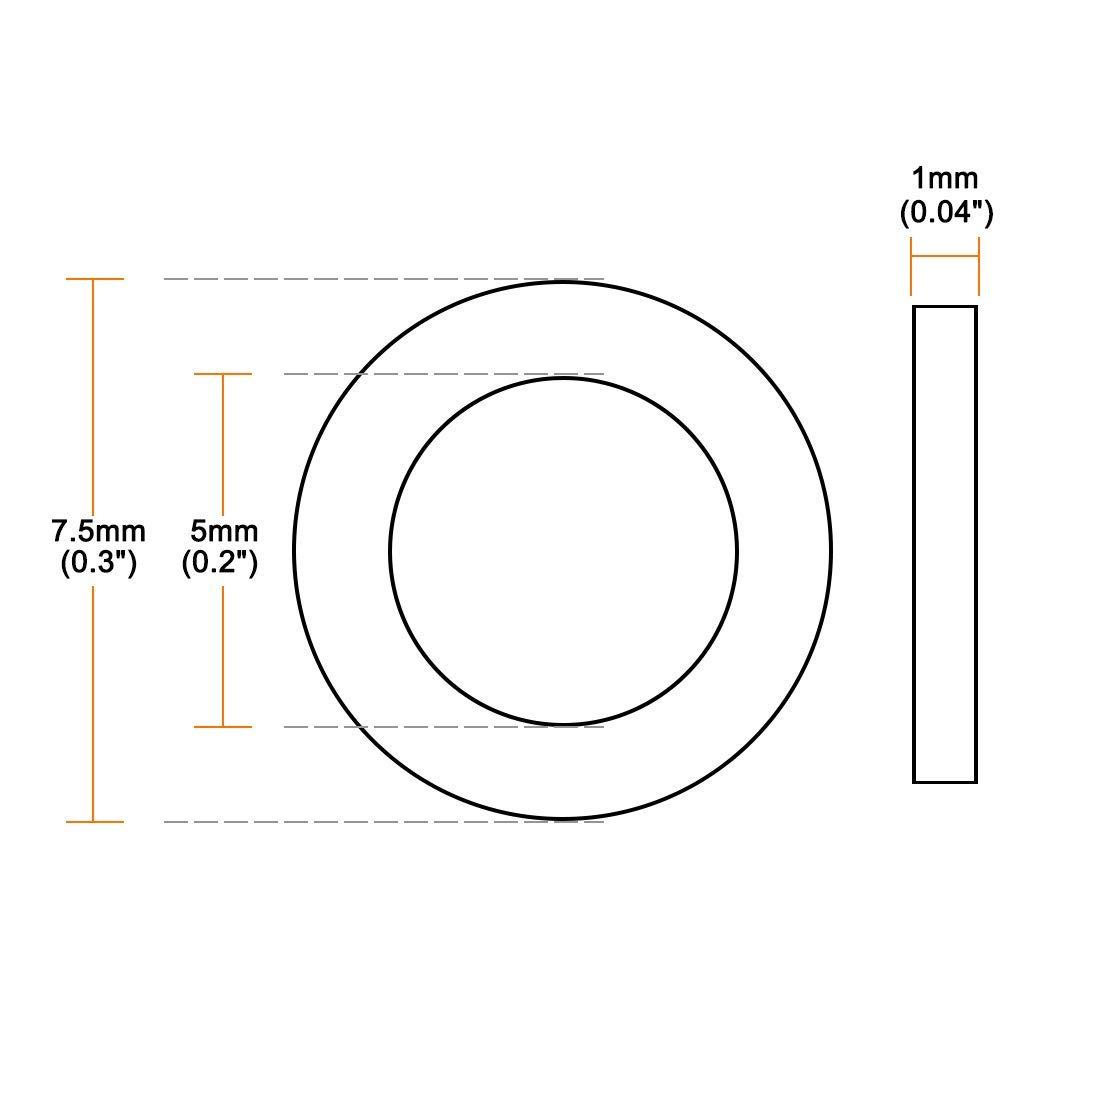 Nylon Flat washers for Screw Bolt M5 7.5 mm OD 1 mm Transparent Thickness 50PCS